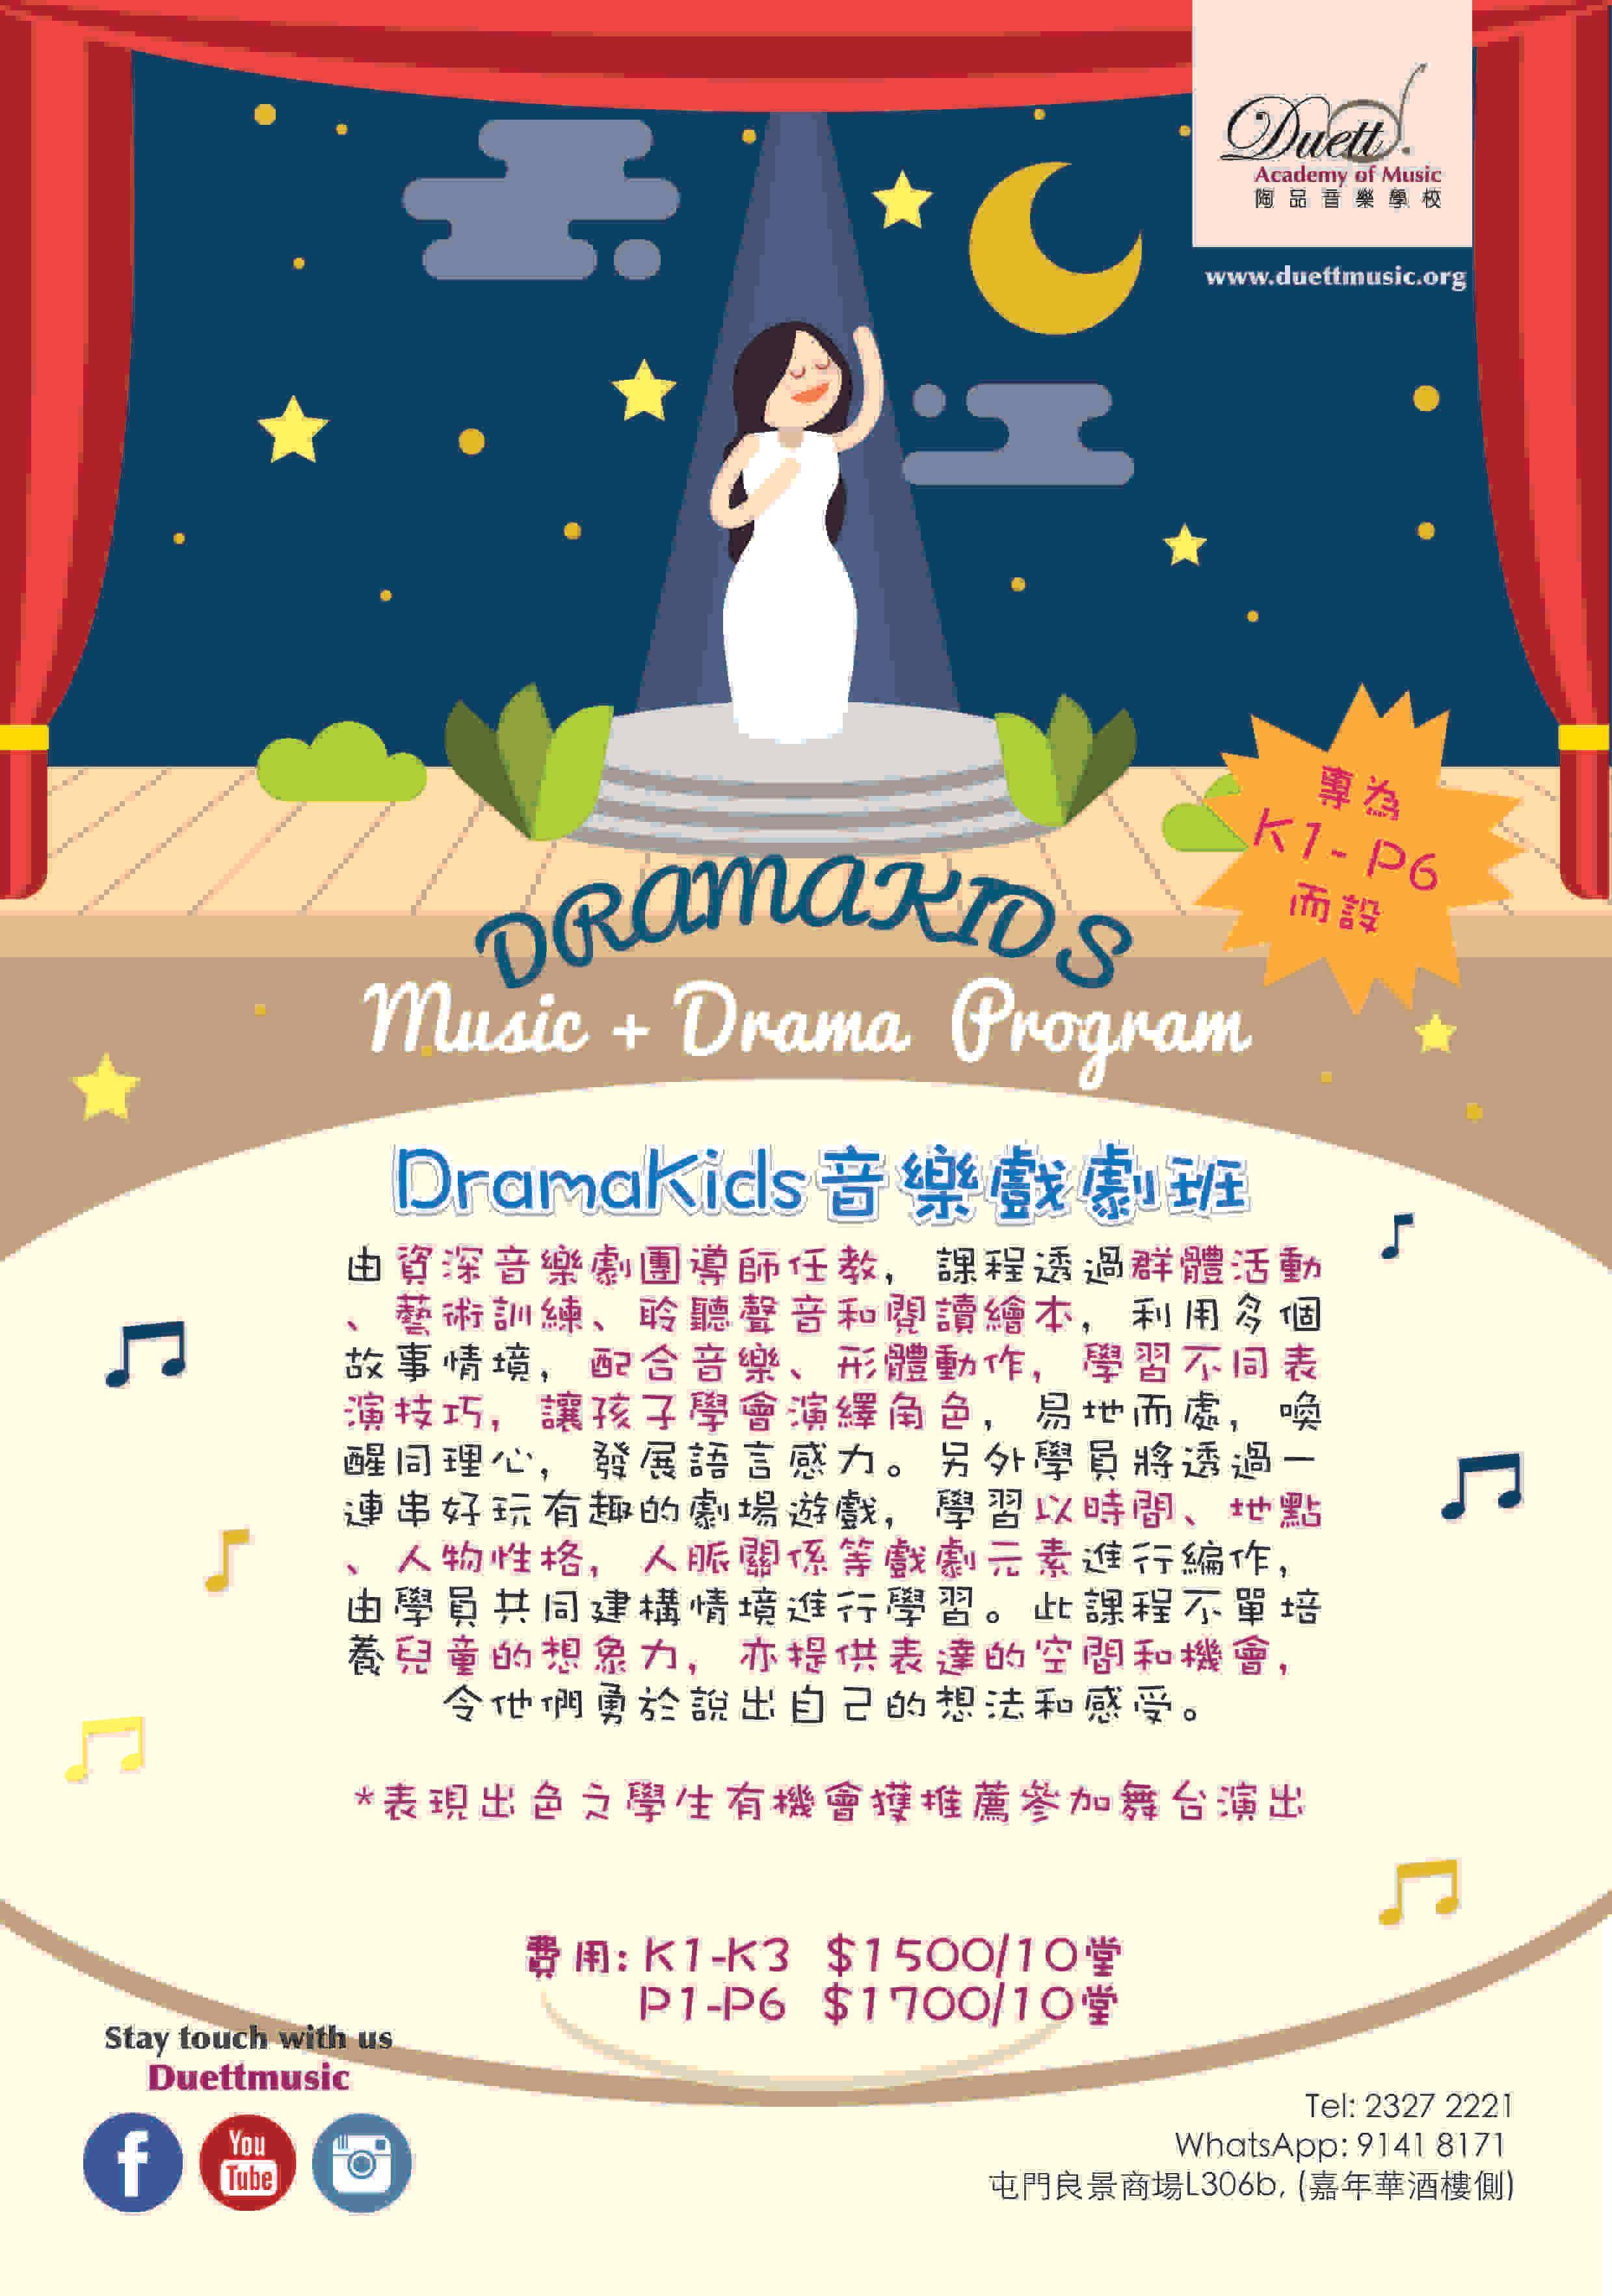 DramaKids